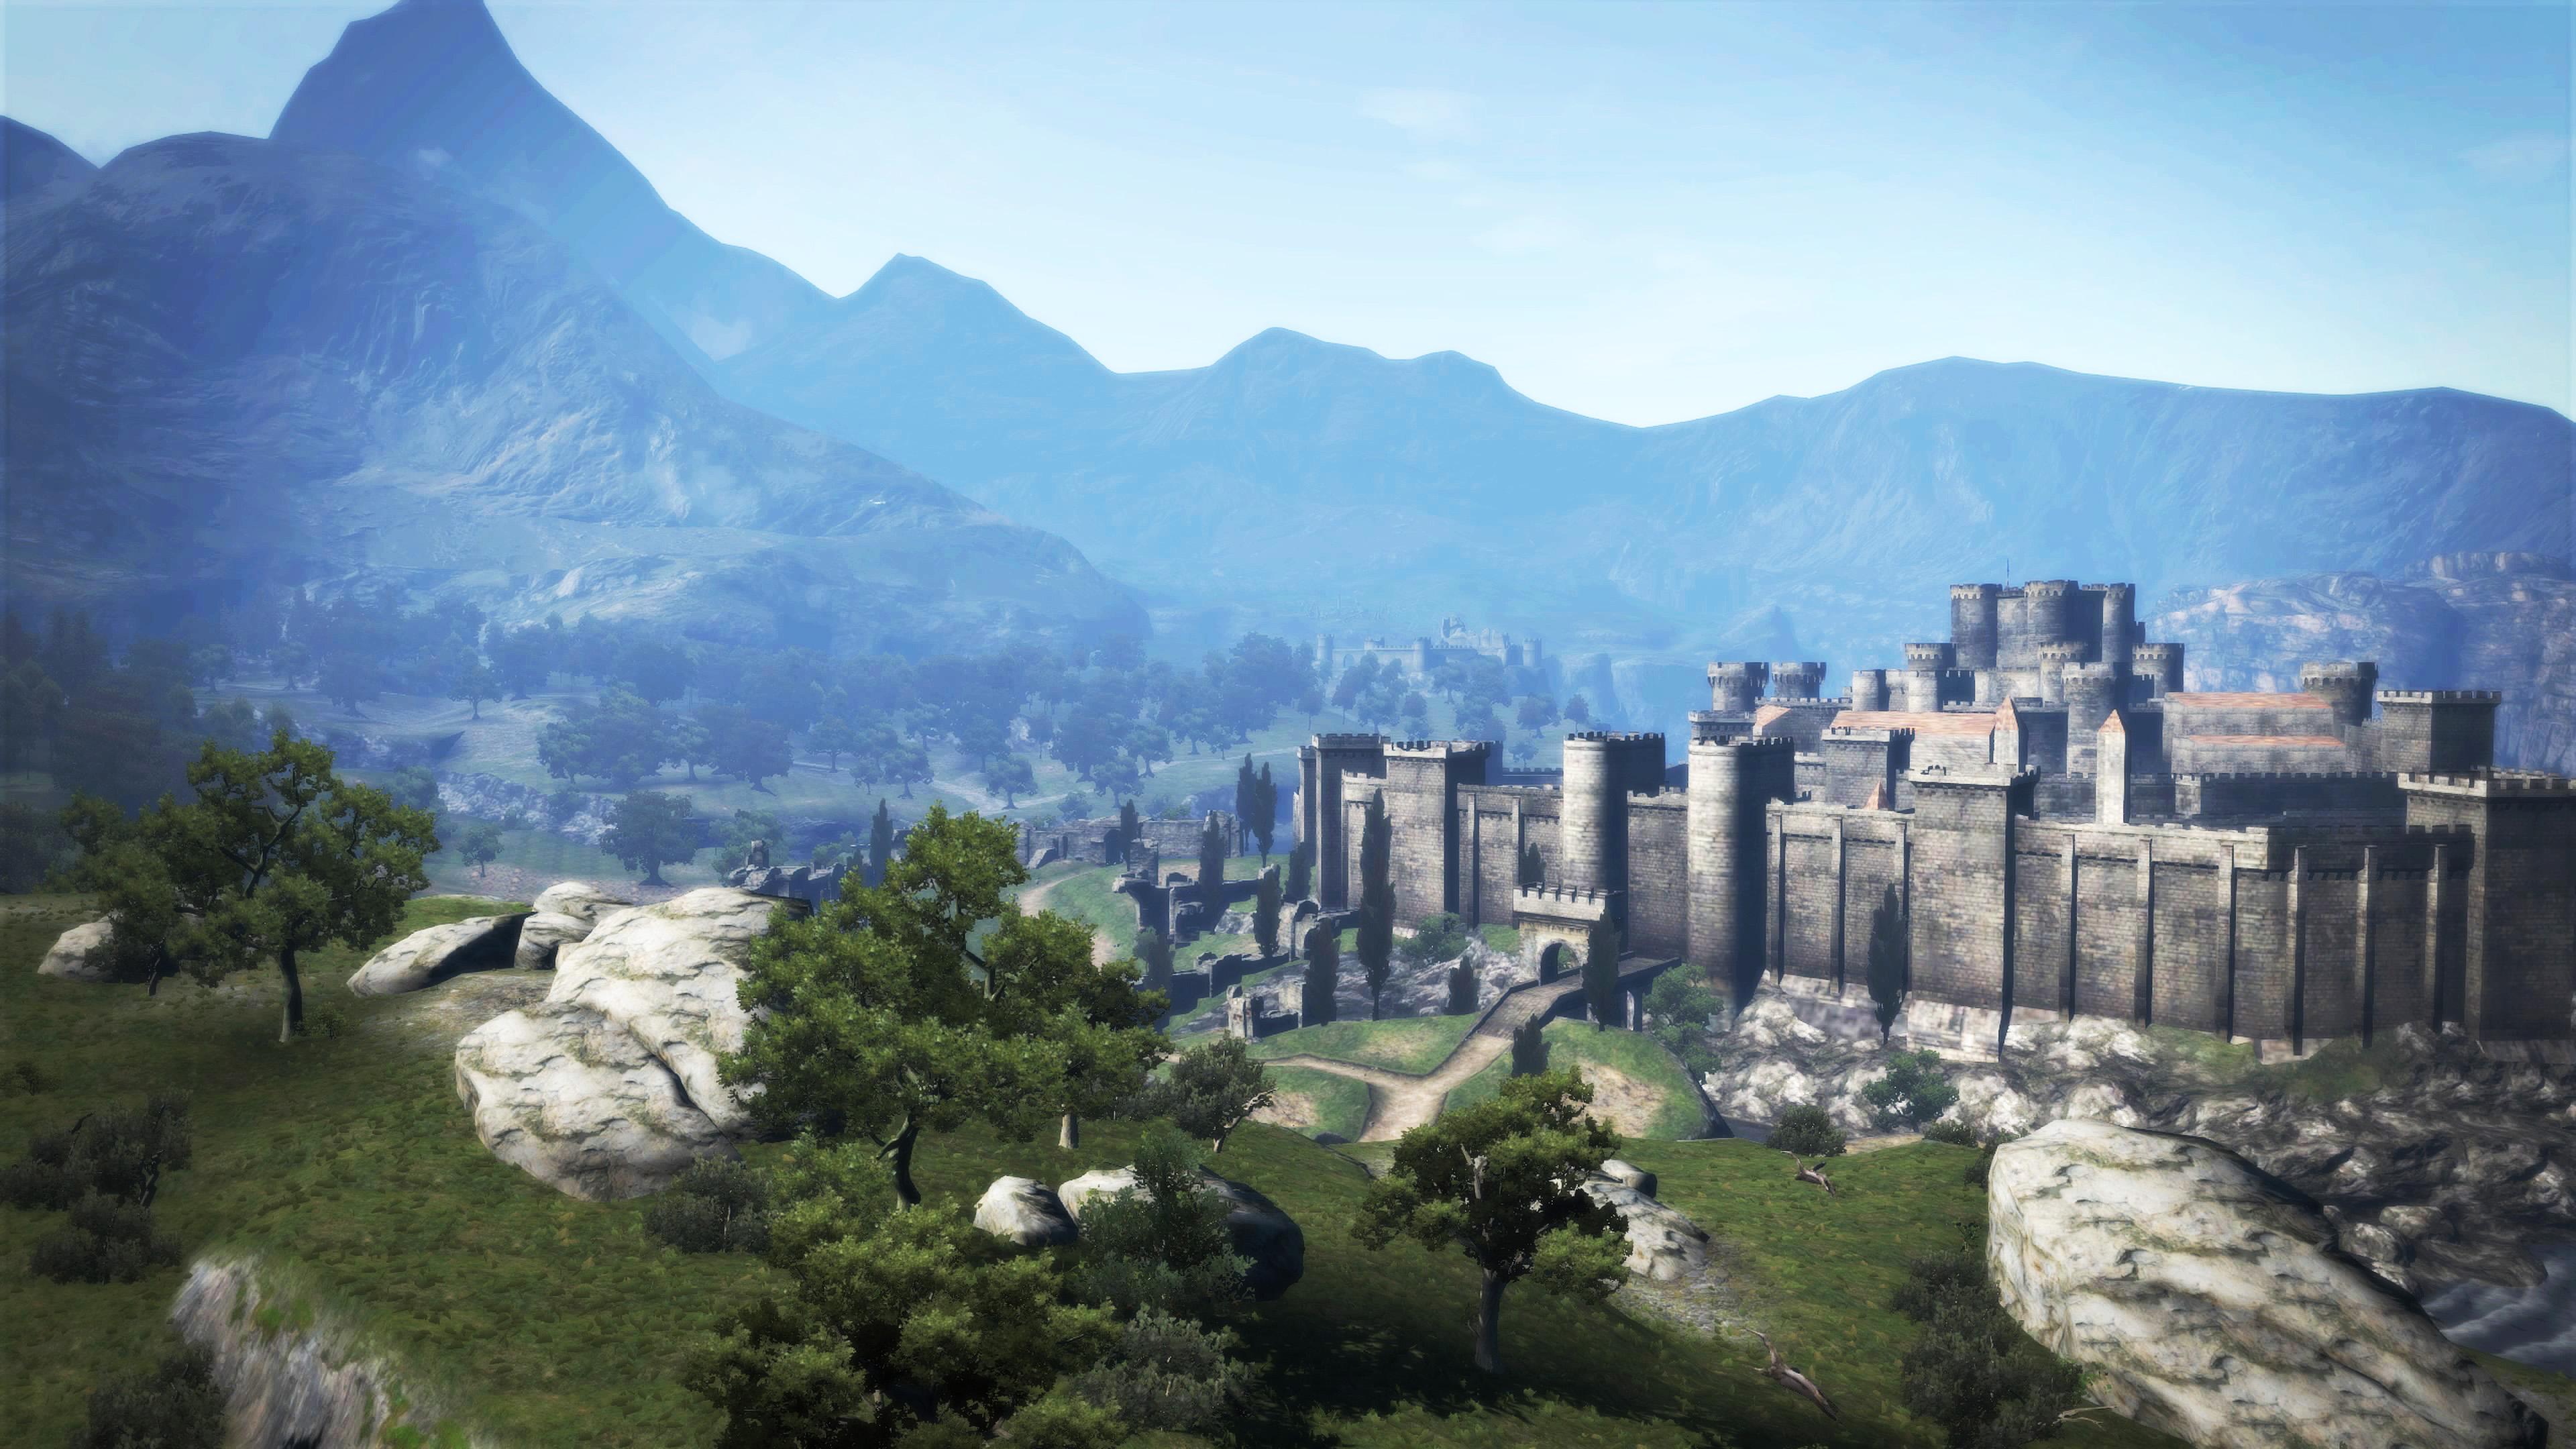 3. října vyjde Dragon's Dogma: Dark Arisen pro PS4 a Xbox One 148235